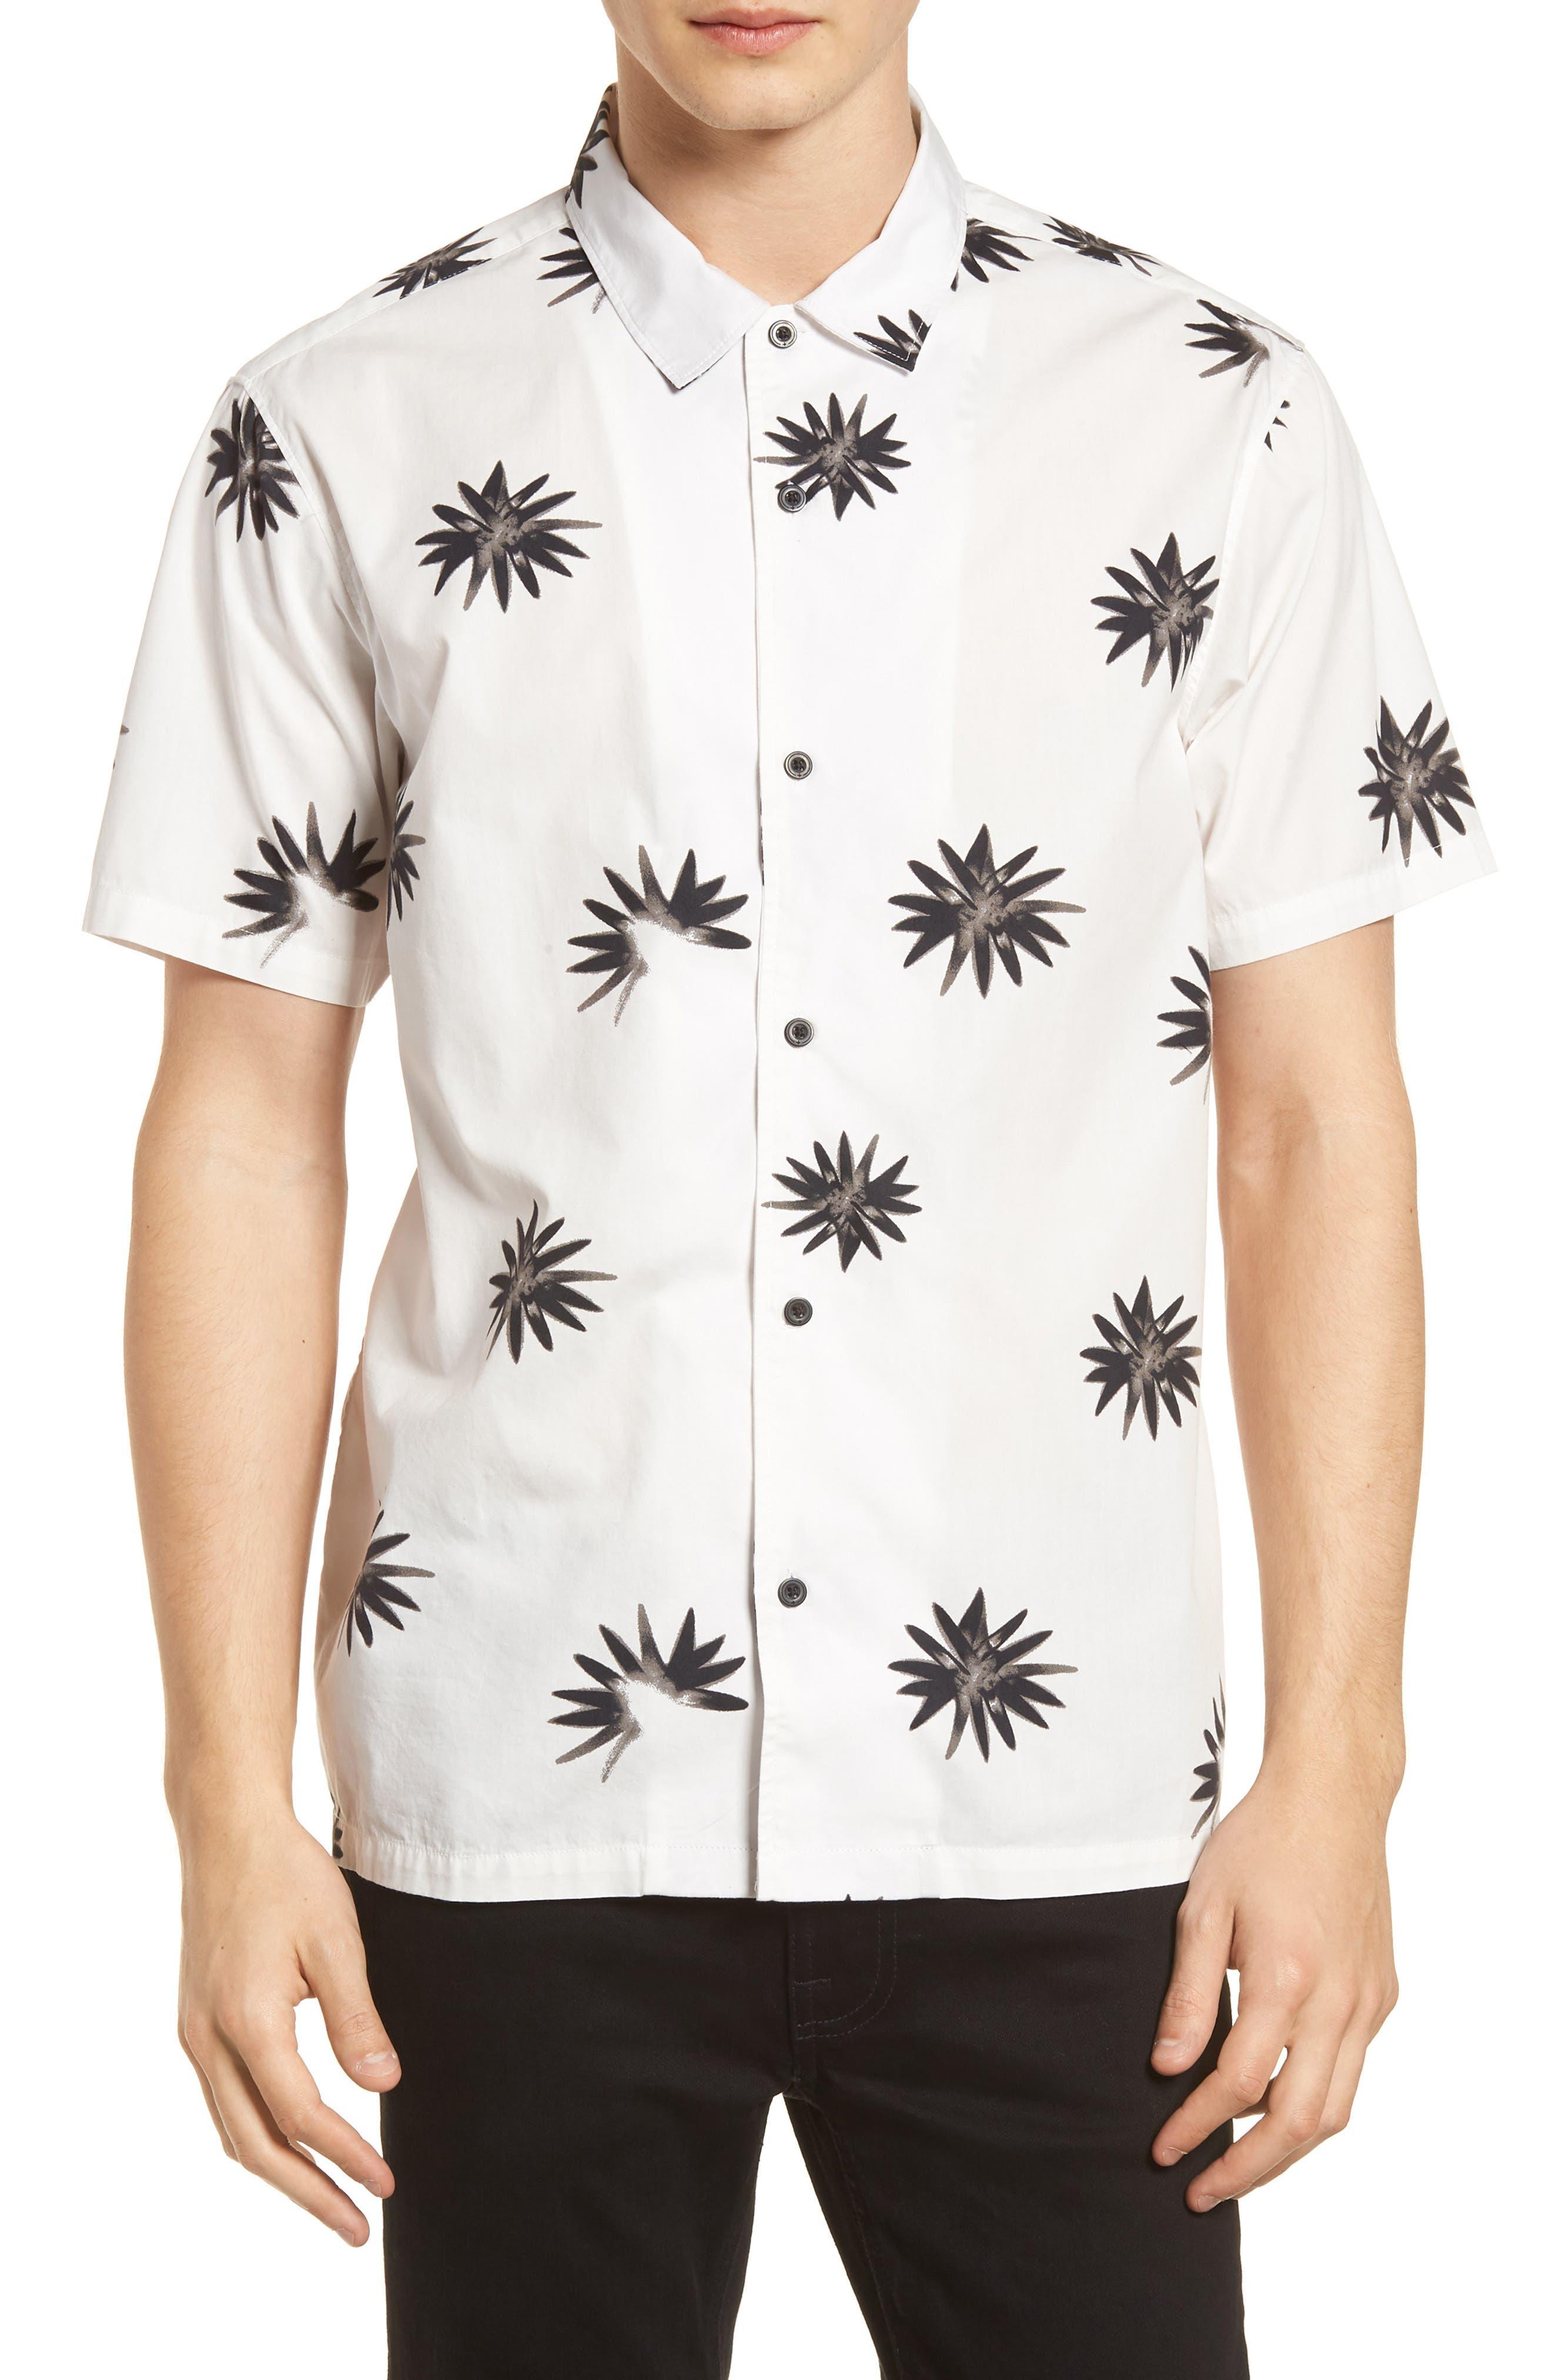 Villa Floral Woven Shirt,                             Main thumbnail 1, color,                             WHITE